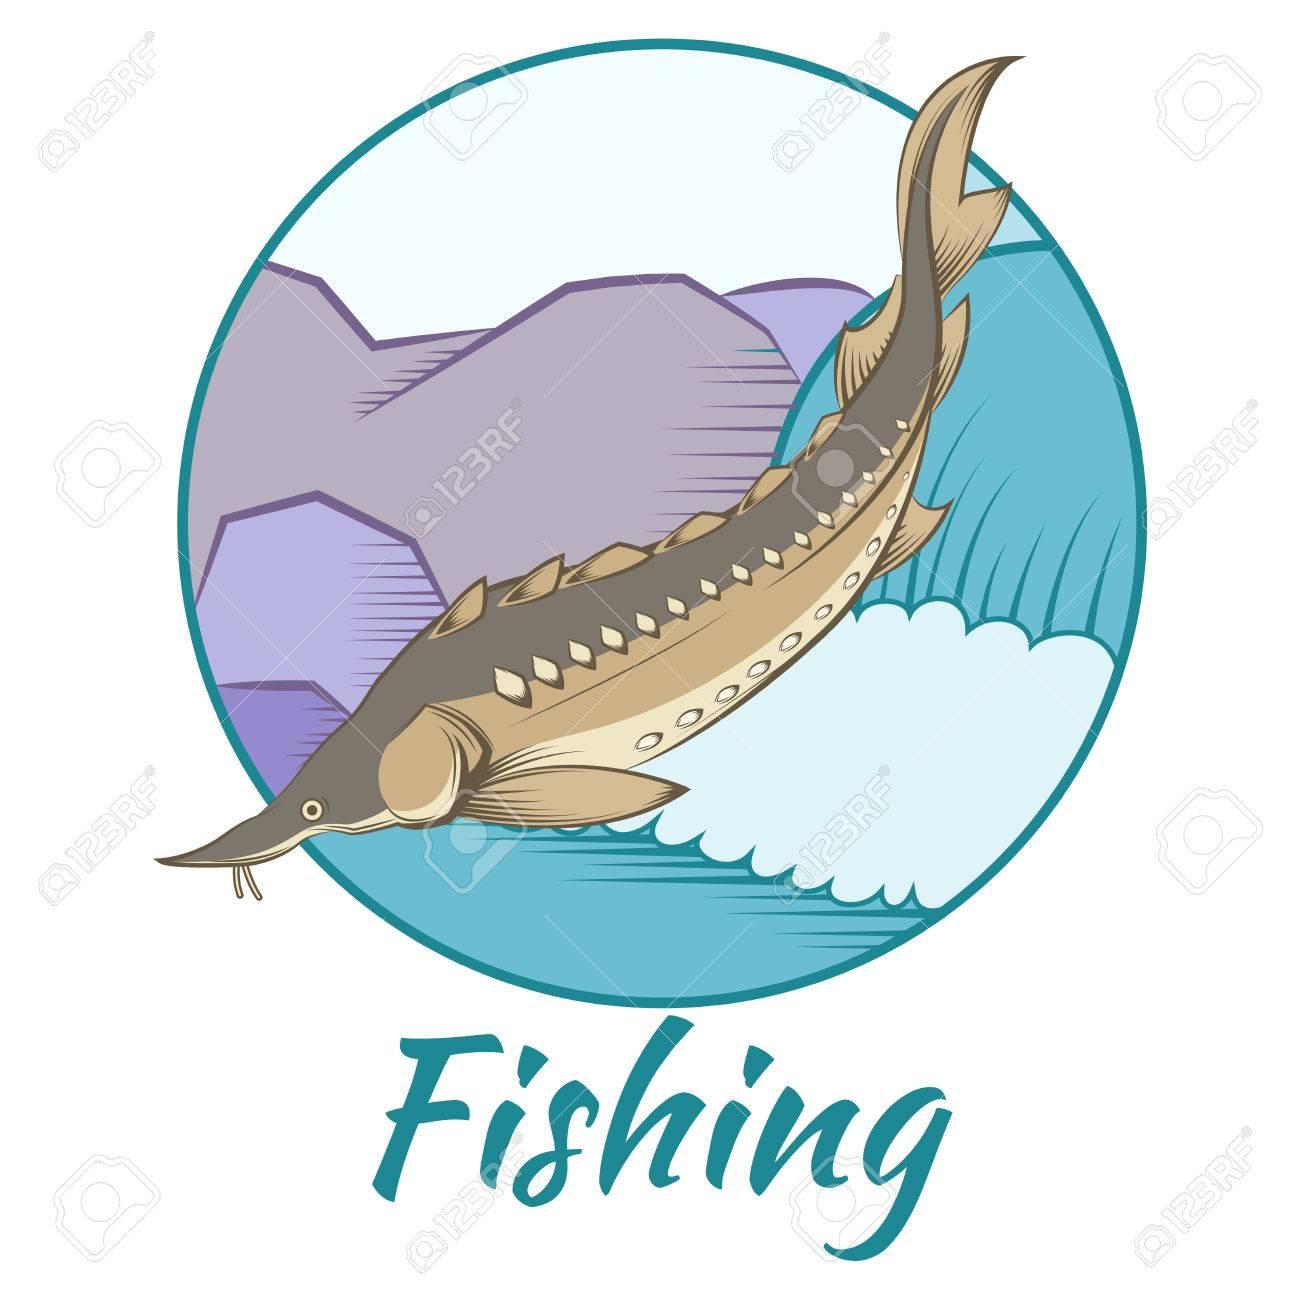 image of a sturgeon fishing banner royalty free cliparts vectors rh 123rf com Sturgeon Point Productions Logo White Sturgeon Clip Art